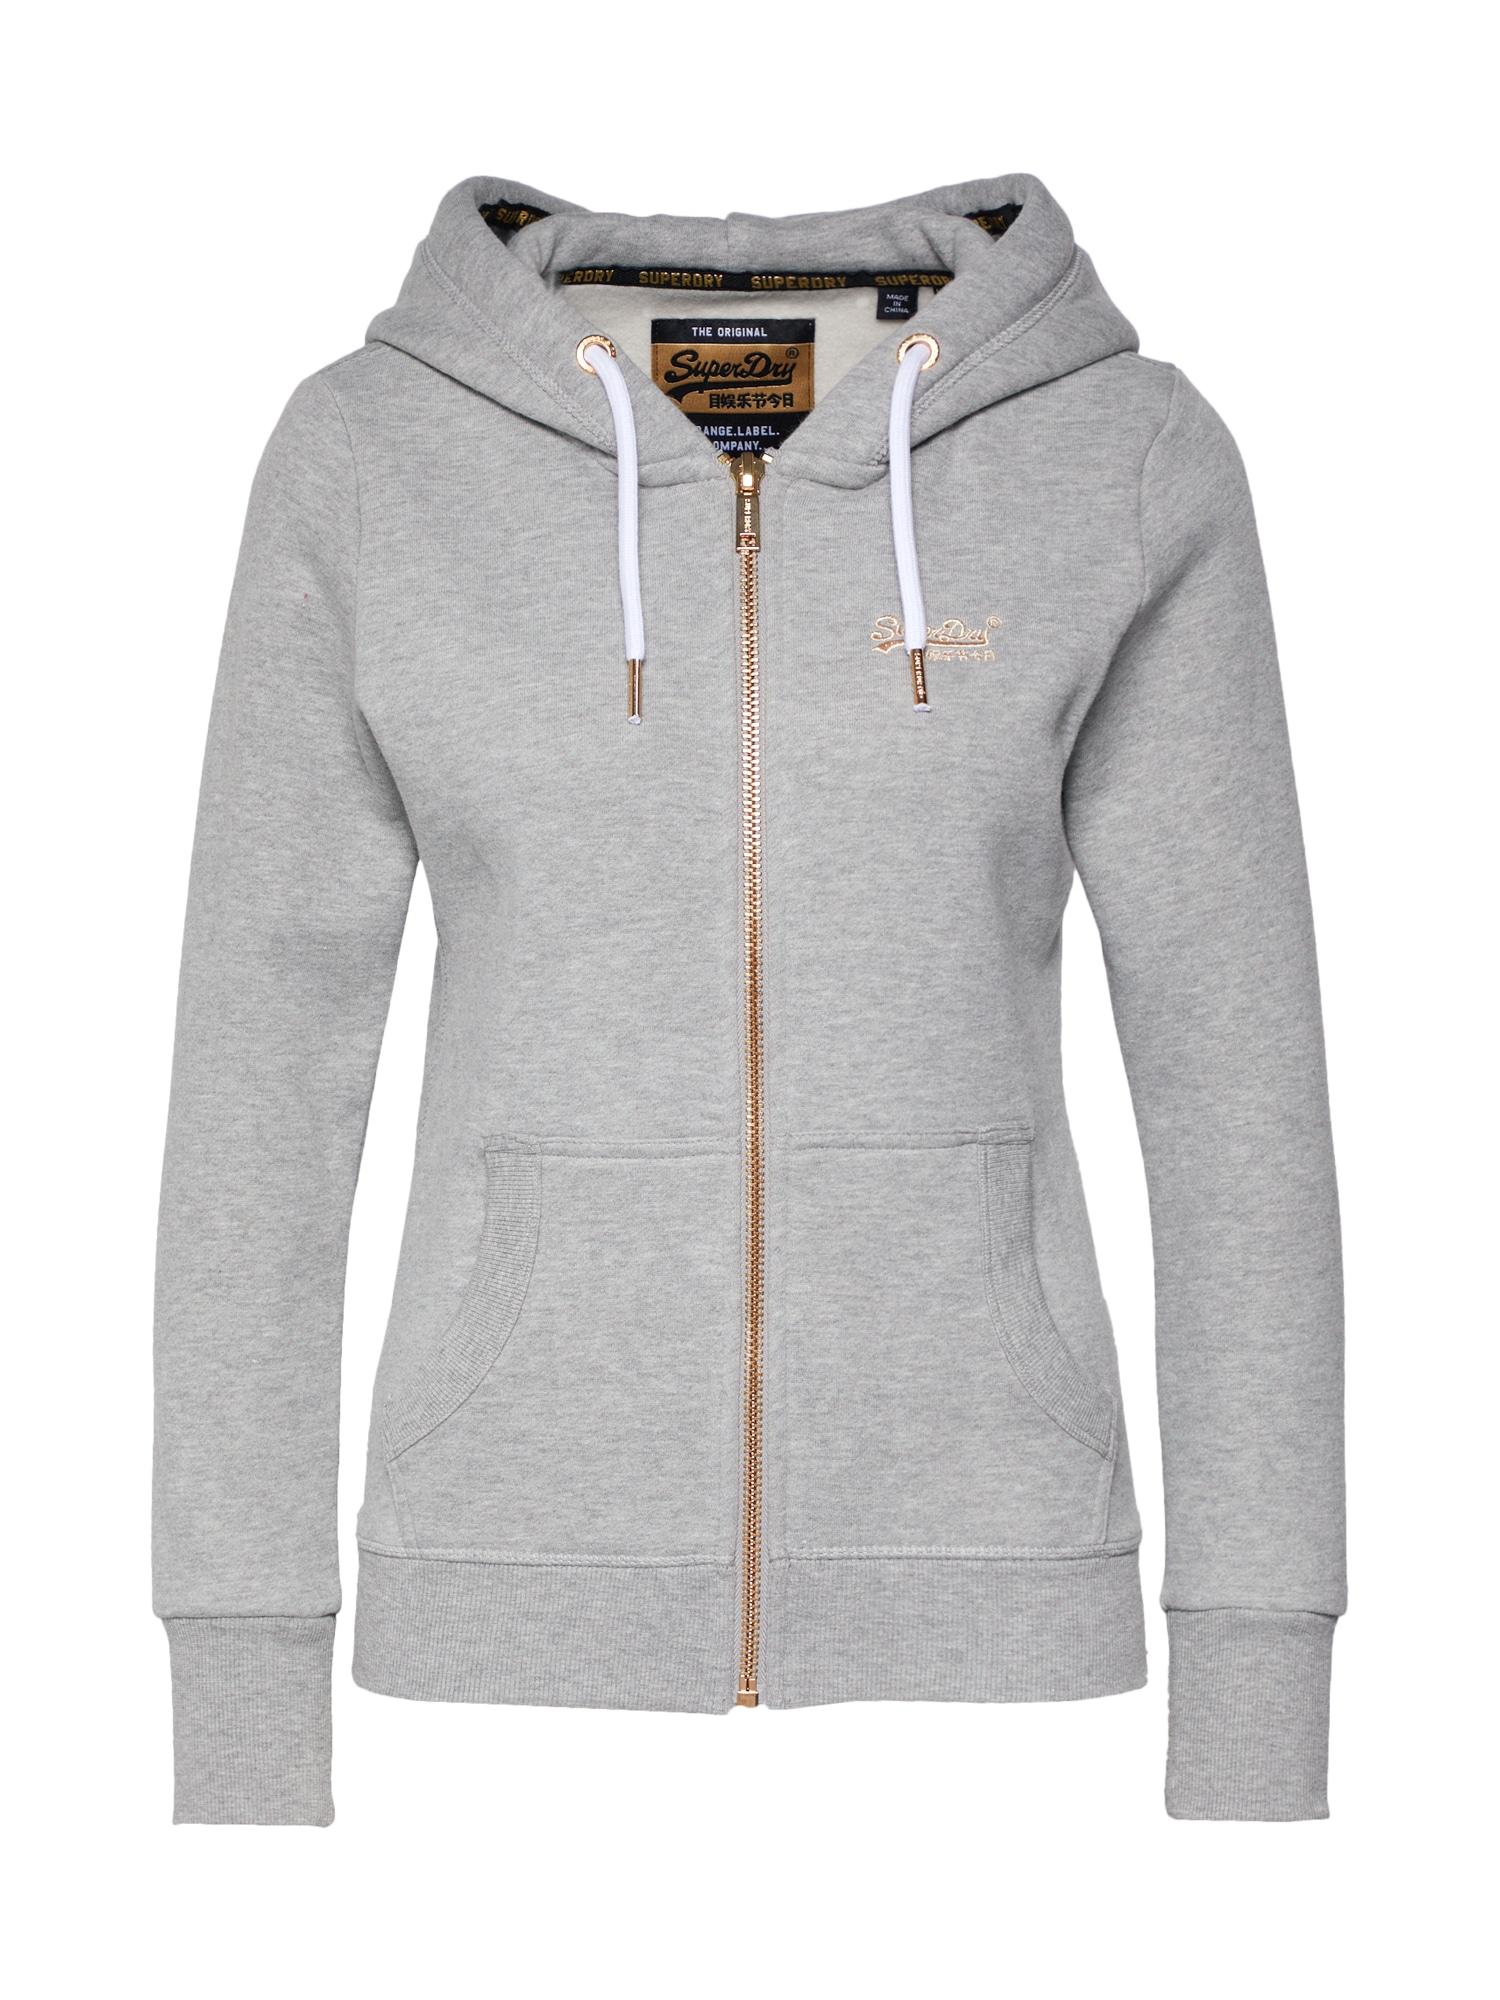 Sweatjacke | Bekleidung > Sweatshirts & -jacken > Sweatjacken | Superdry